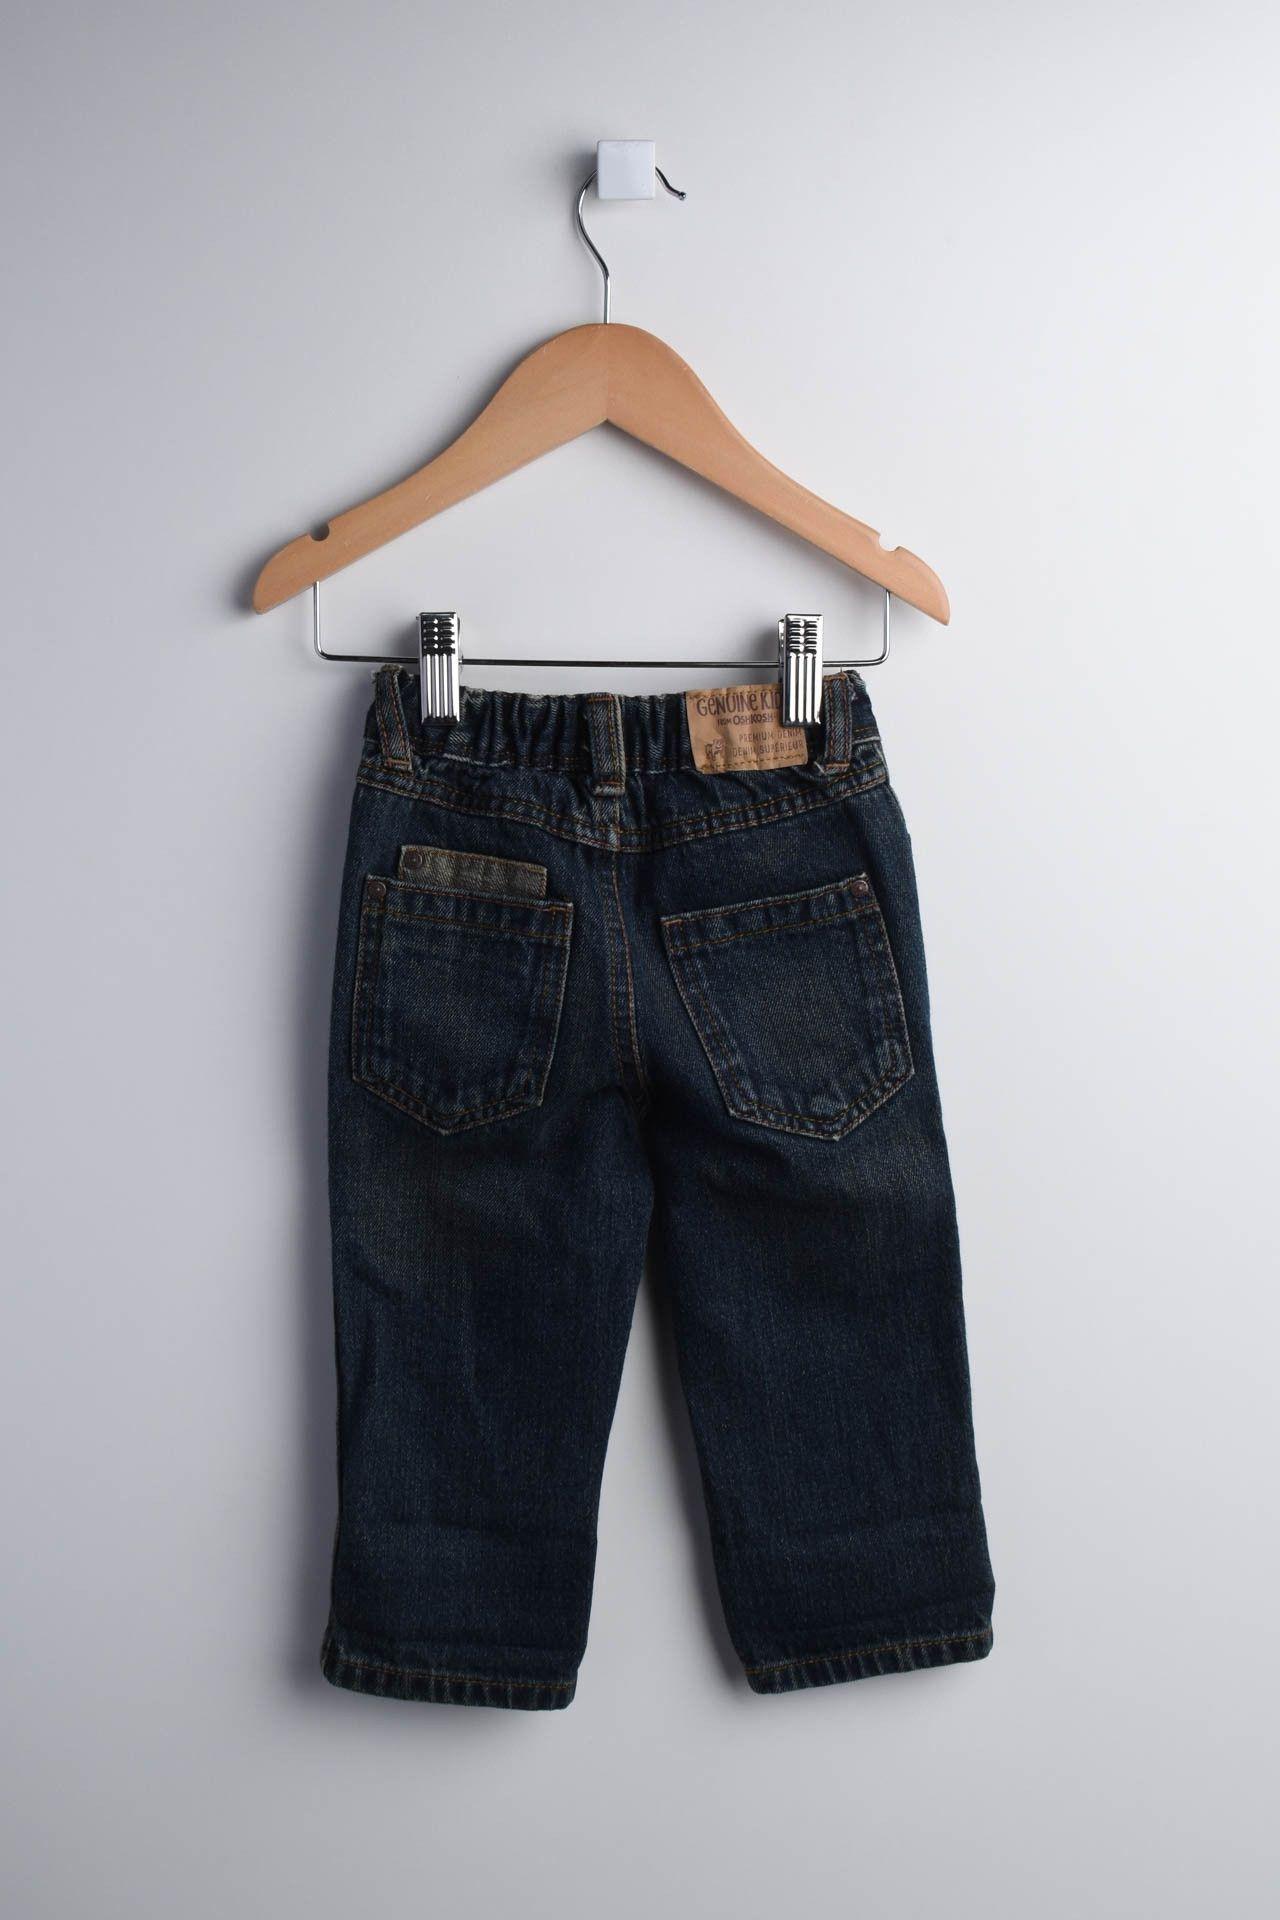 Oshkosh  - Calça Jeans Lavagem - Foto 2